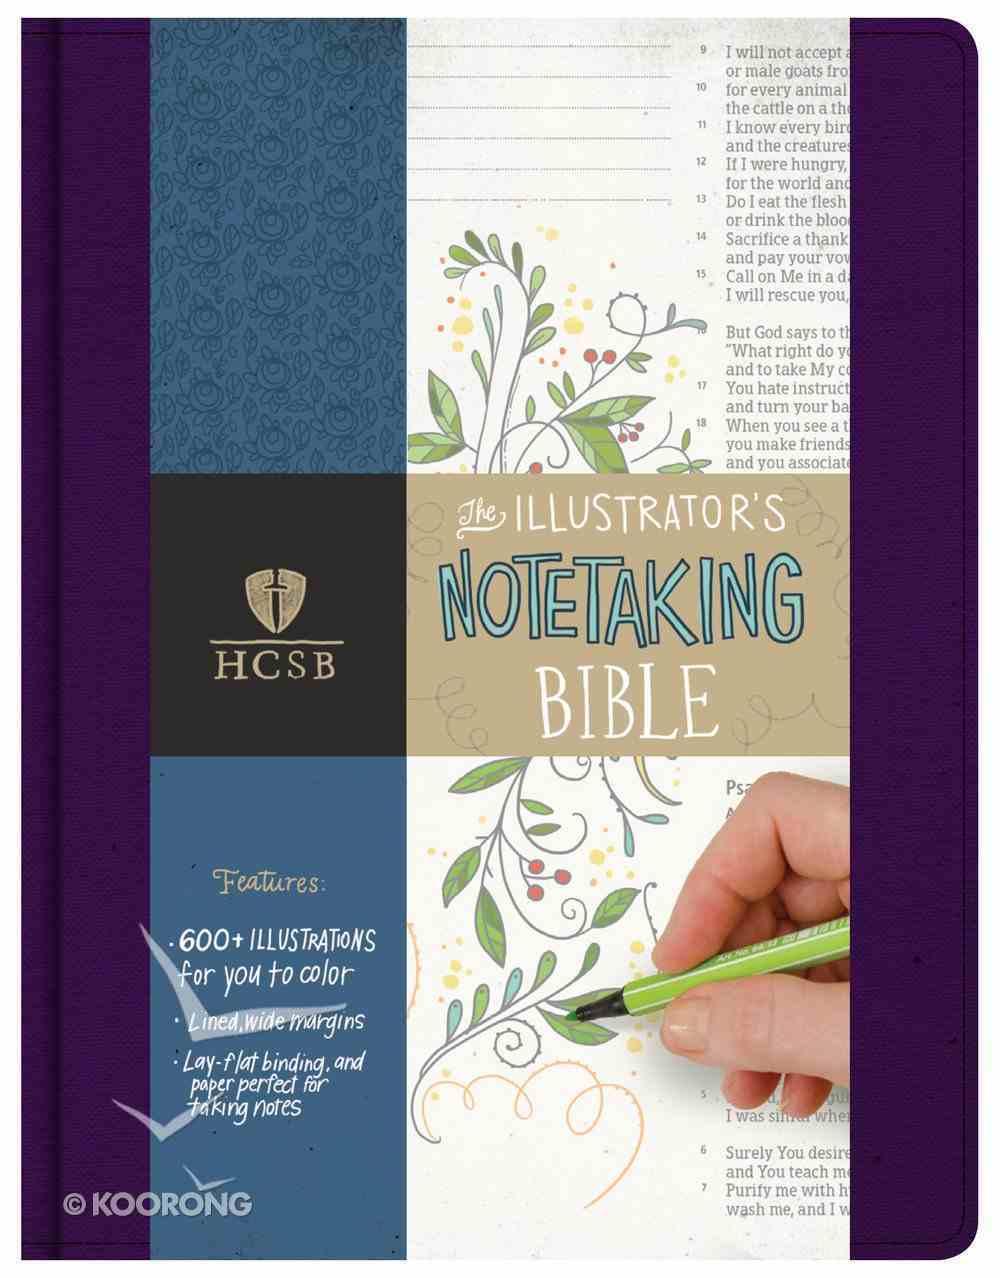 HCSB Illustrator's Notetaking Bible Purple Linen Fabric Over Hardback